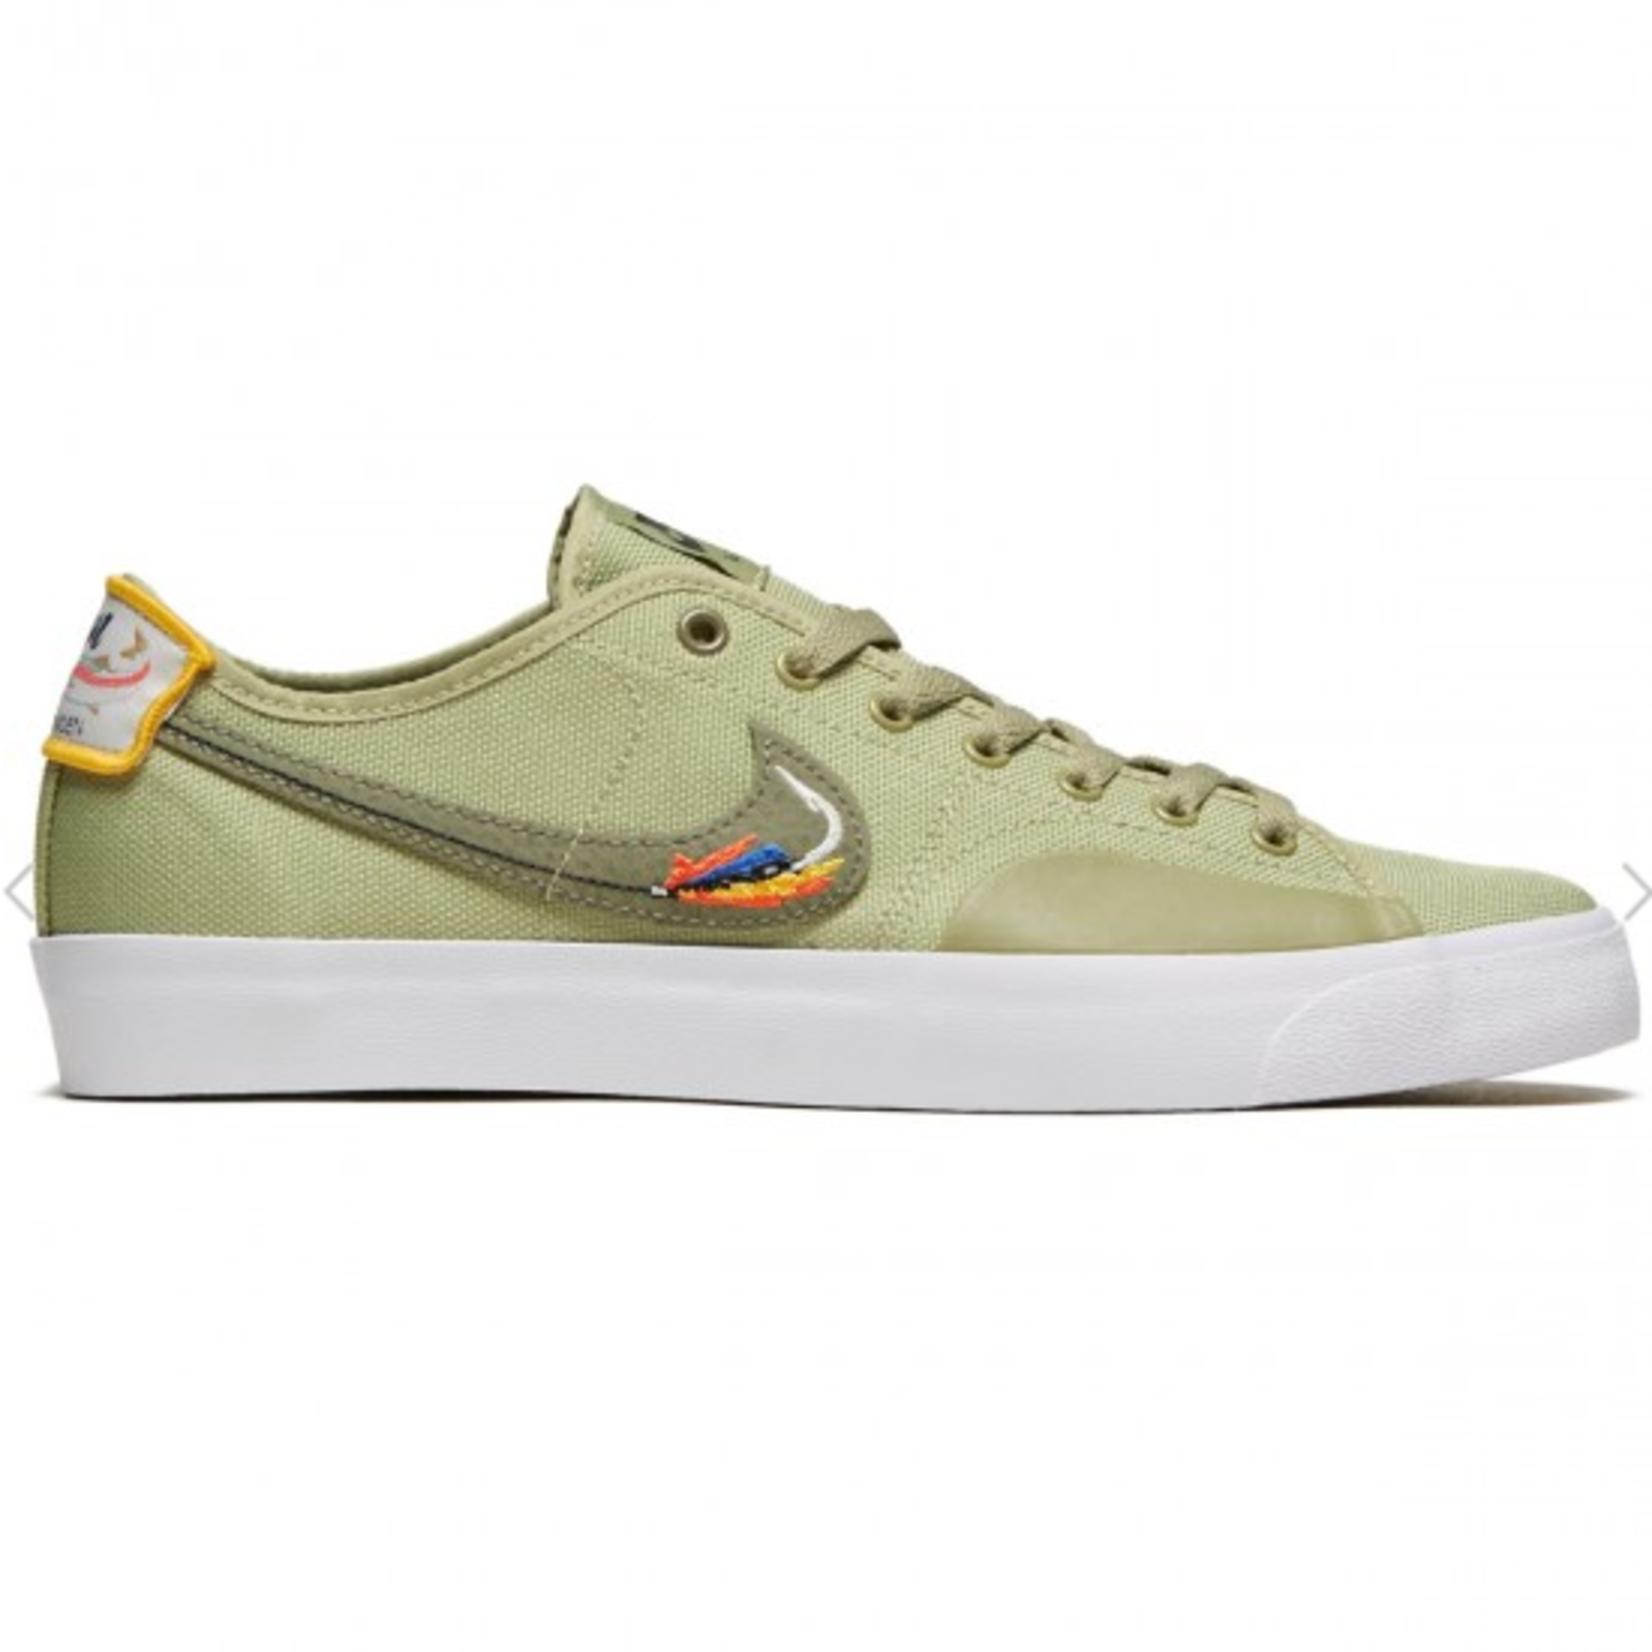 Nike Nike SB BLZR Court DVDL Dusty Olive/Medium Olive